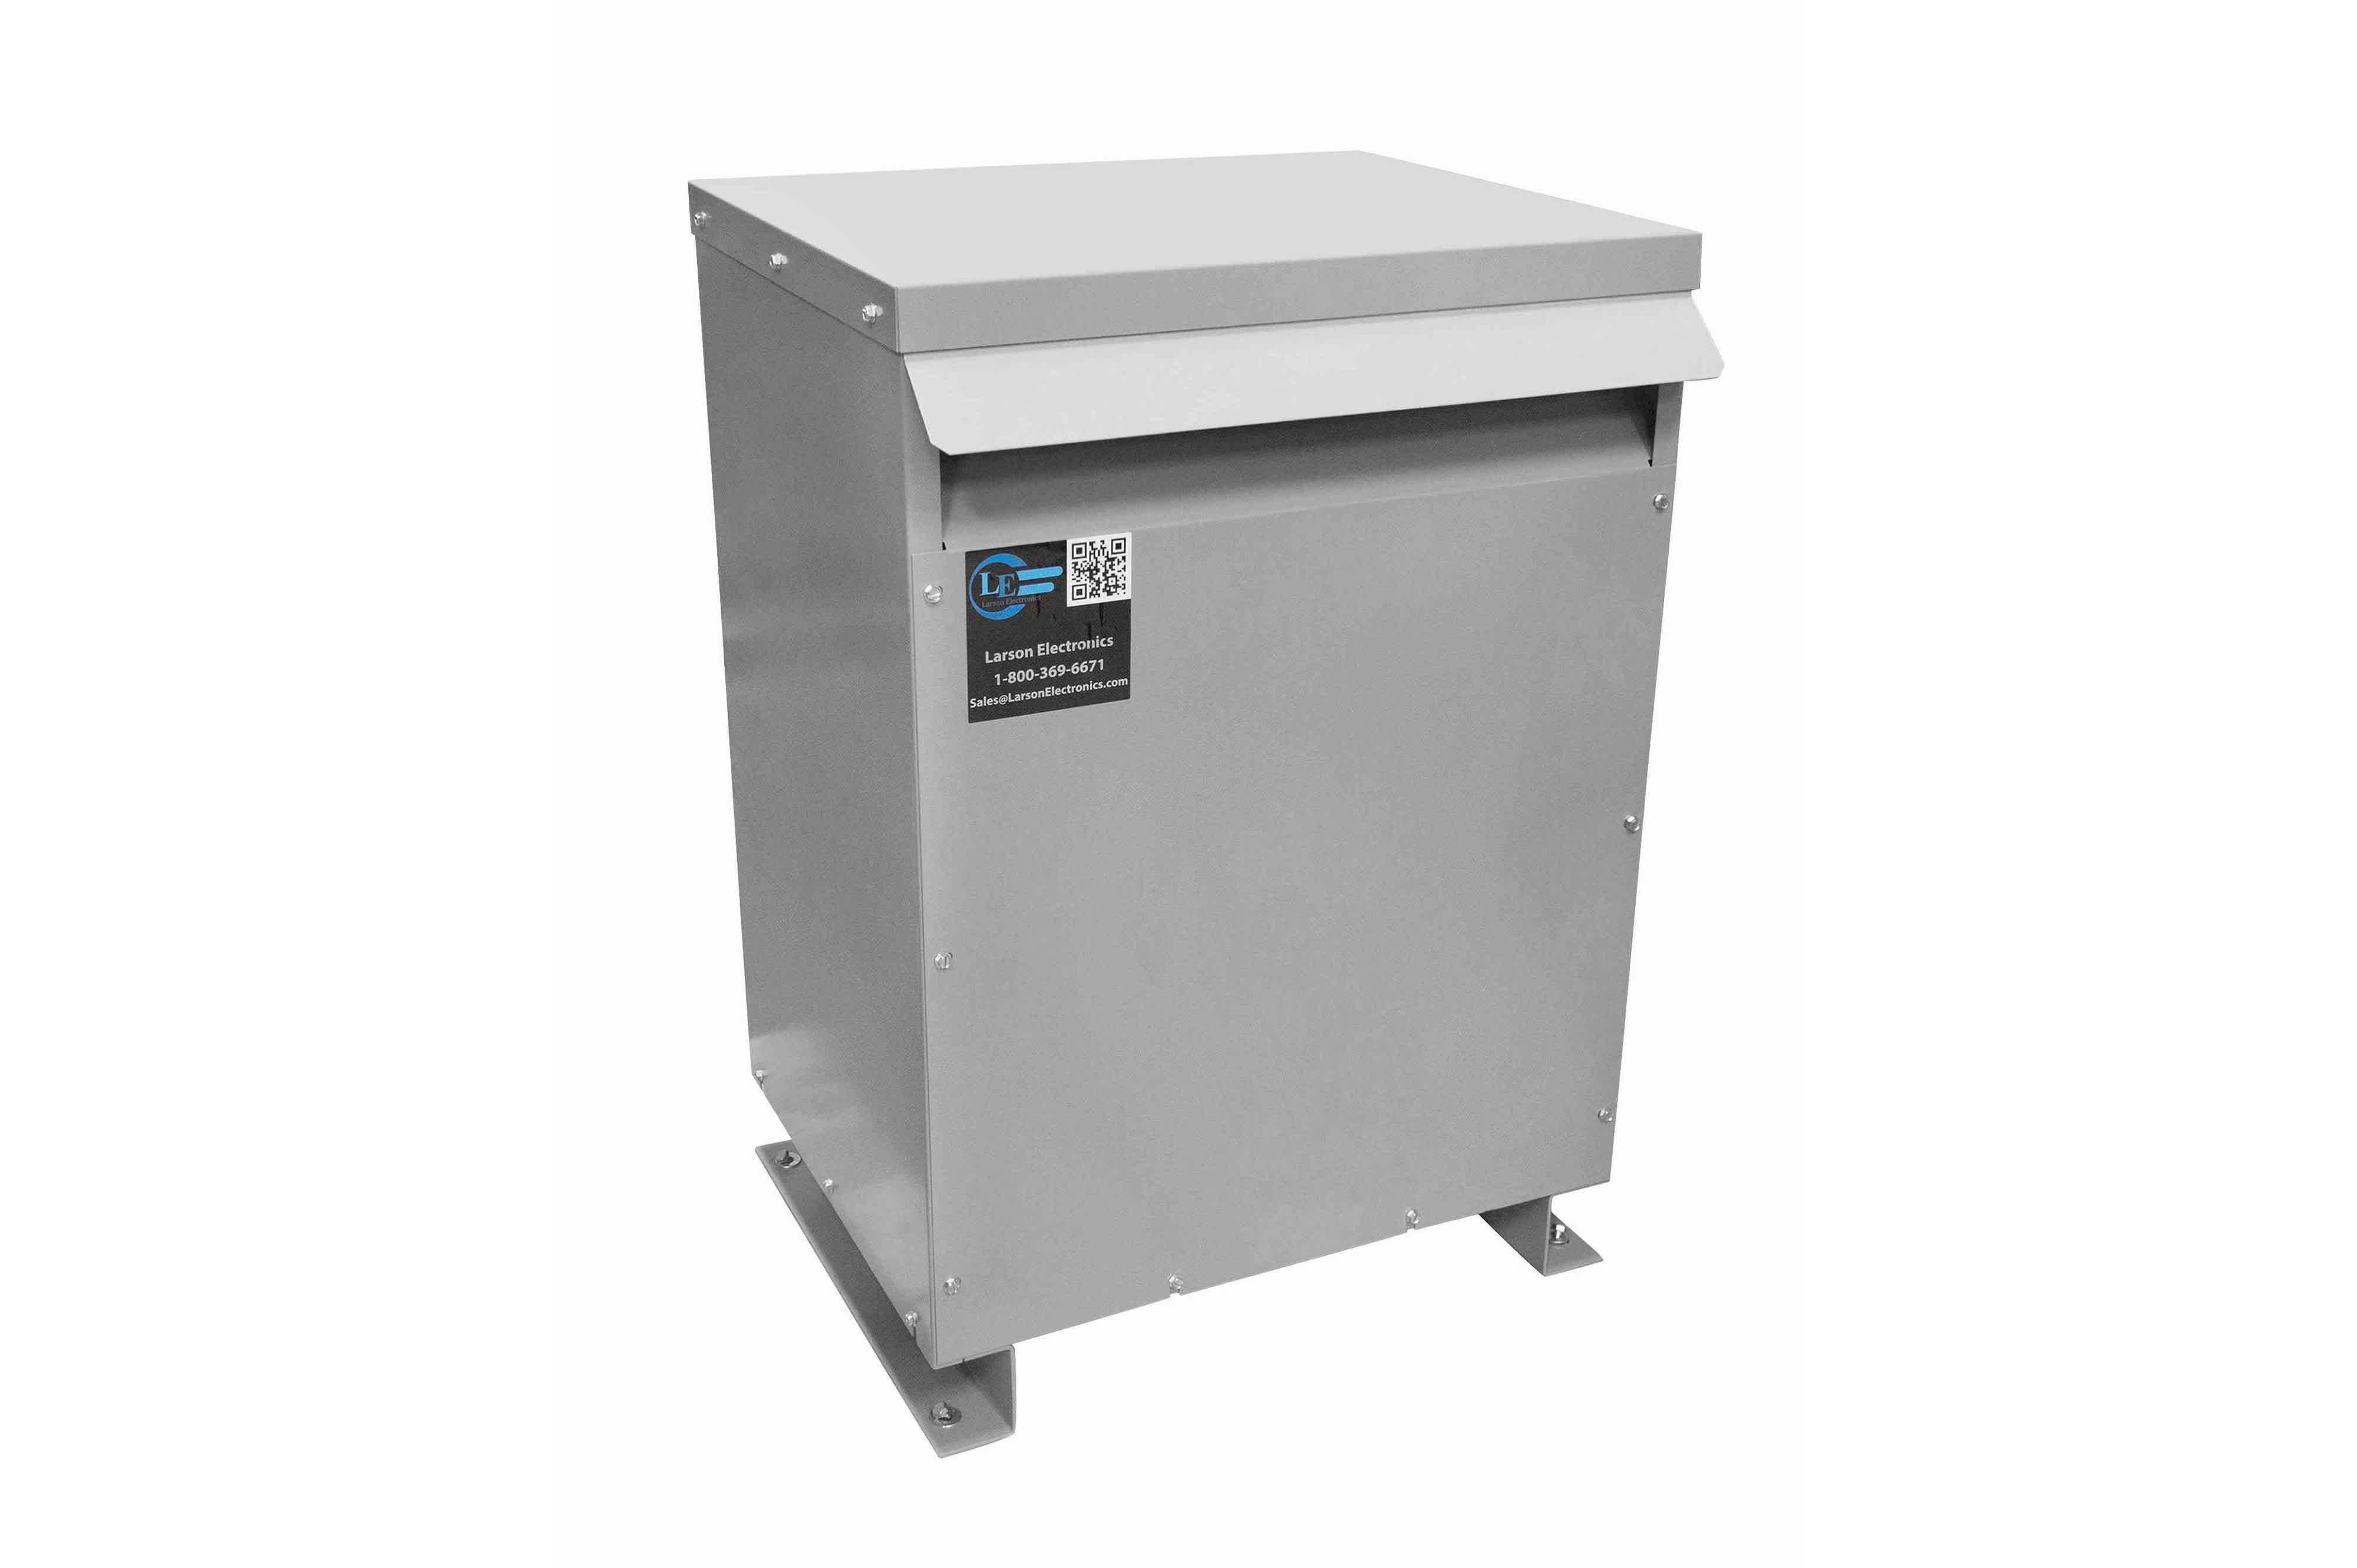 37.5 kVA 3PH Isolation Transformer, 460V Wye Primary, 600V Delta Secondary, N3R, Ventilated, 60 Hz